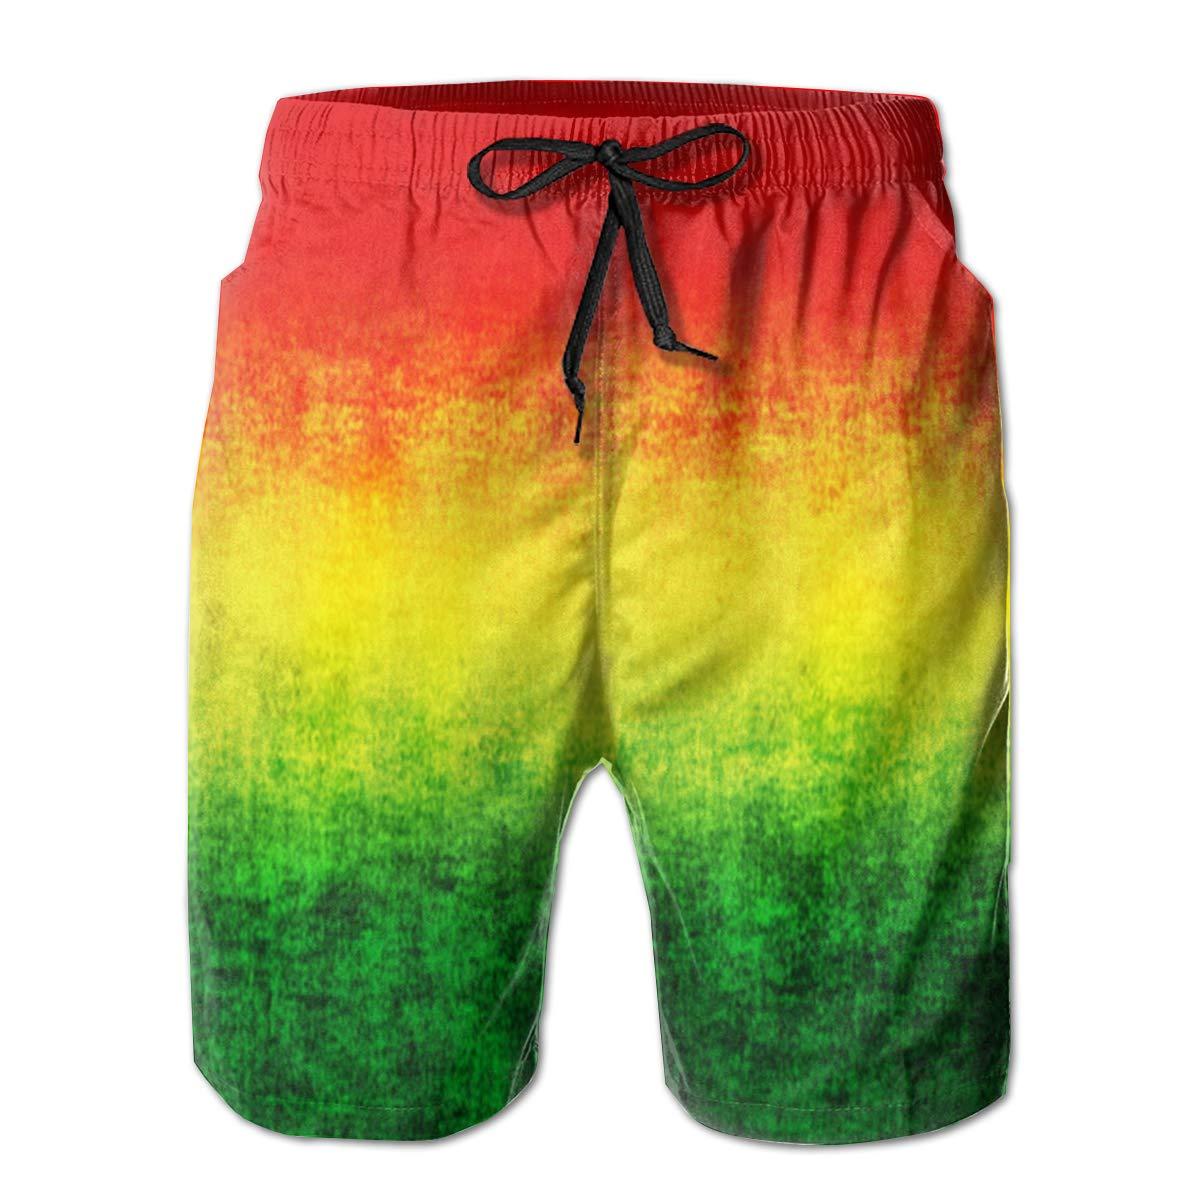 Large Feature Rasta Grunge YongColer Mens Swim Trunks Quick Dry Beach Shorts